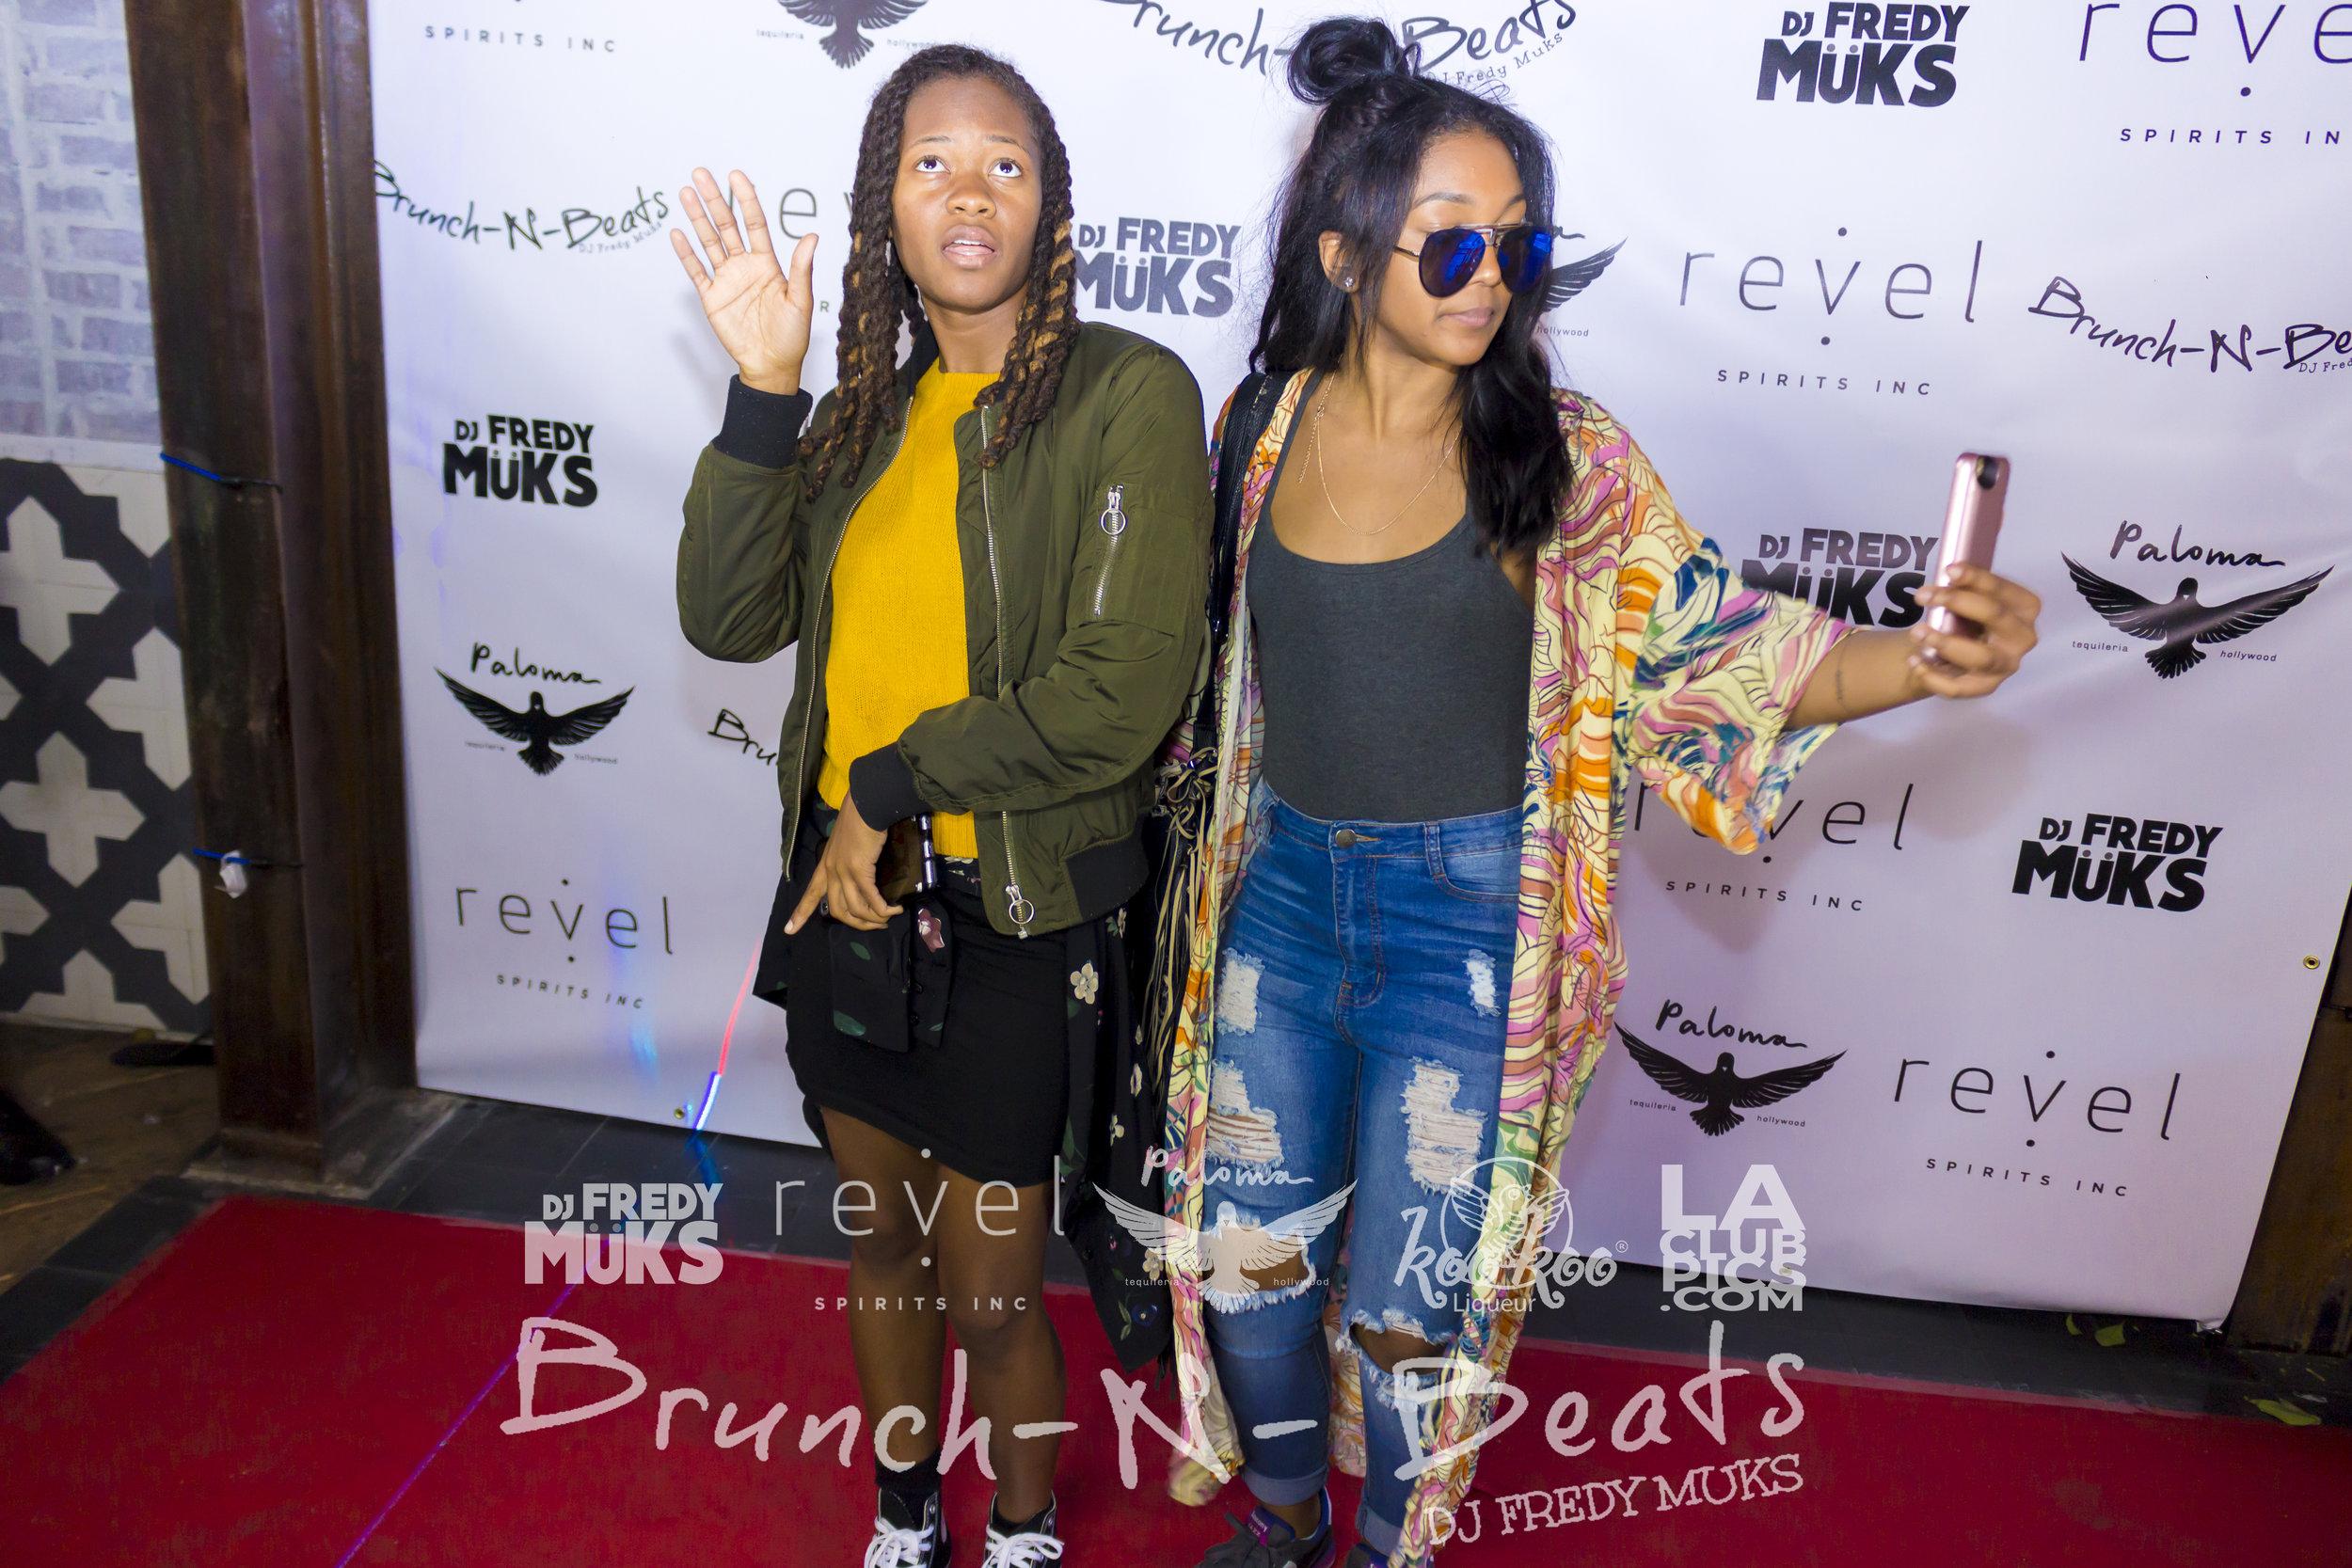 Brunch-N-Beats - Paloma Hollywood - 02-25-18_124.jpg